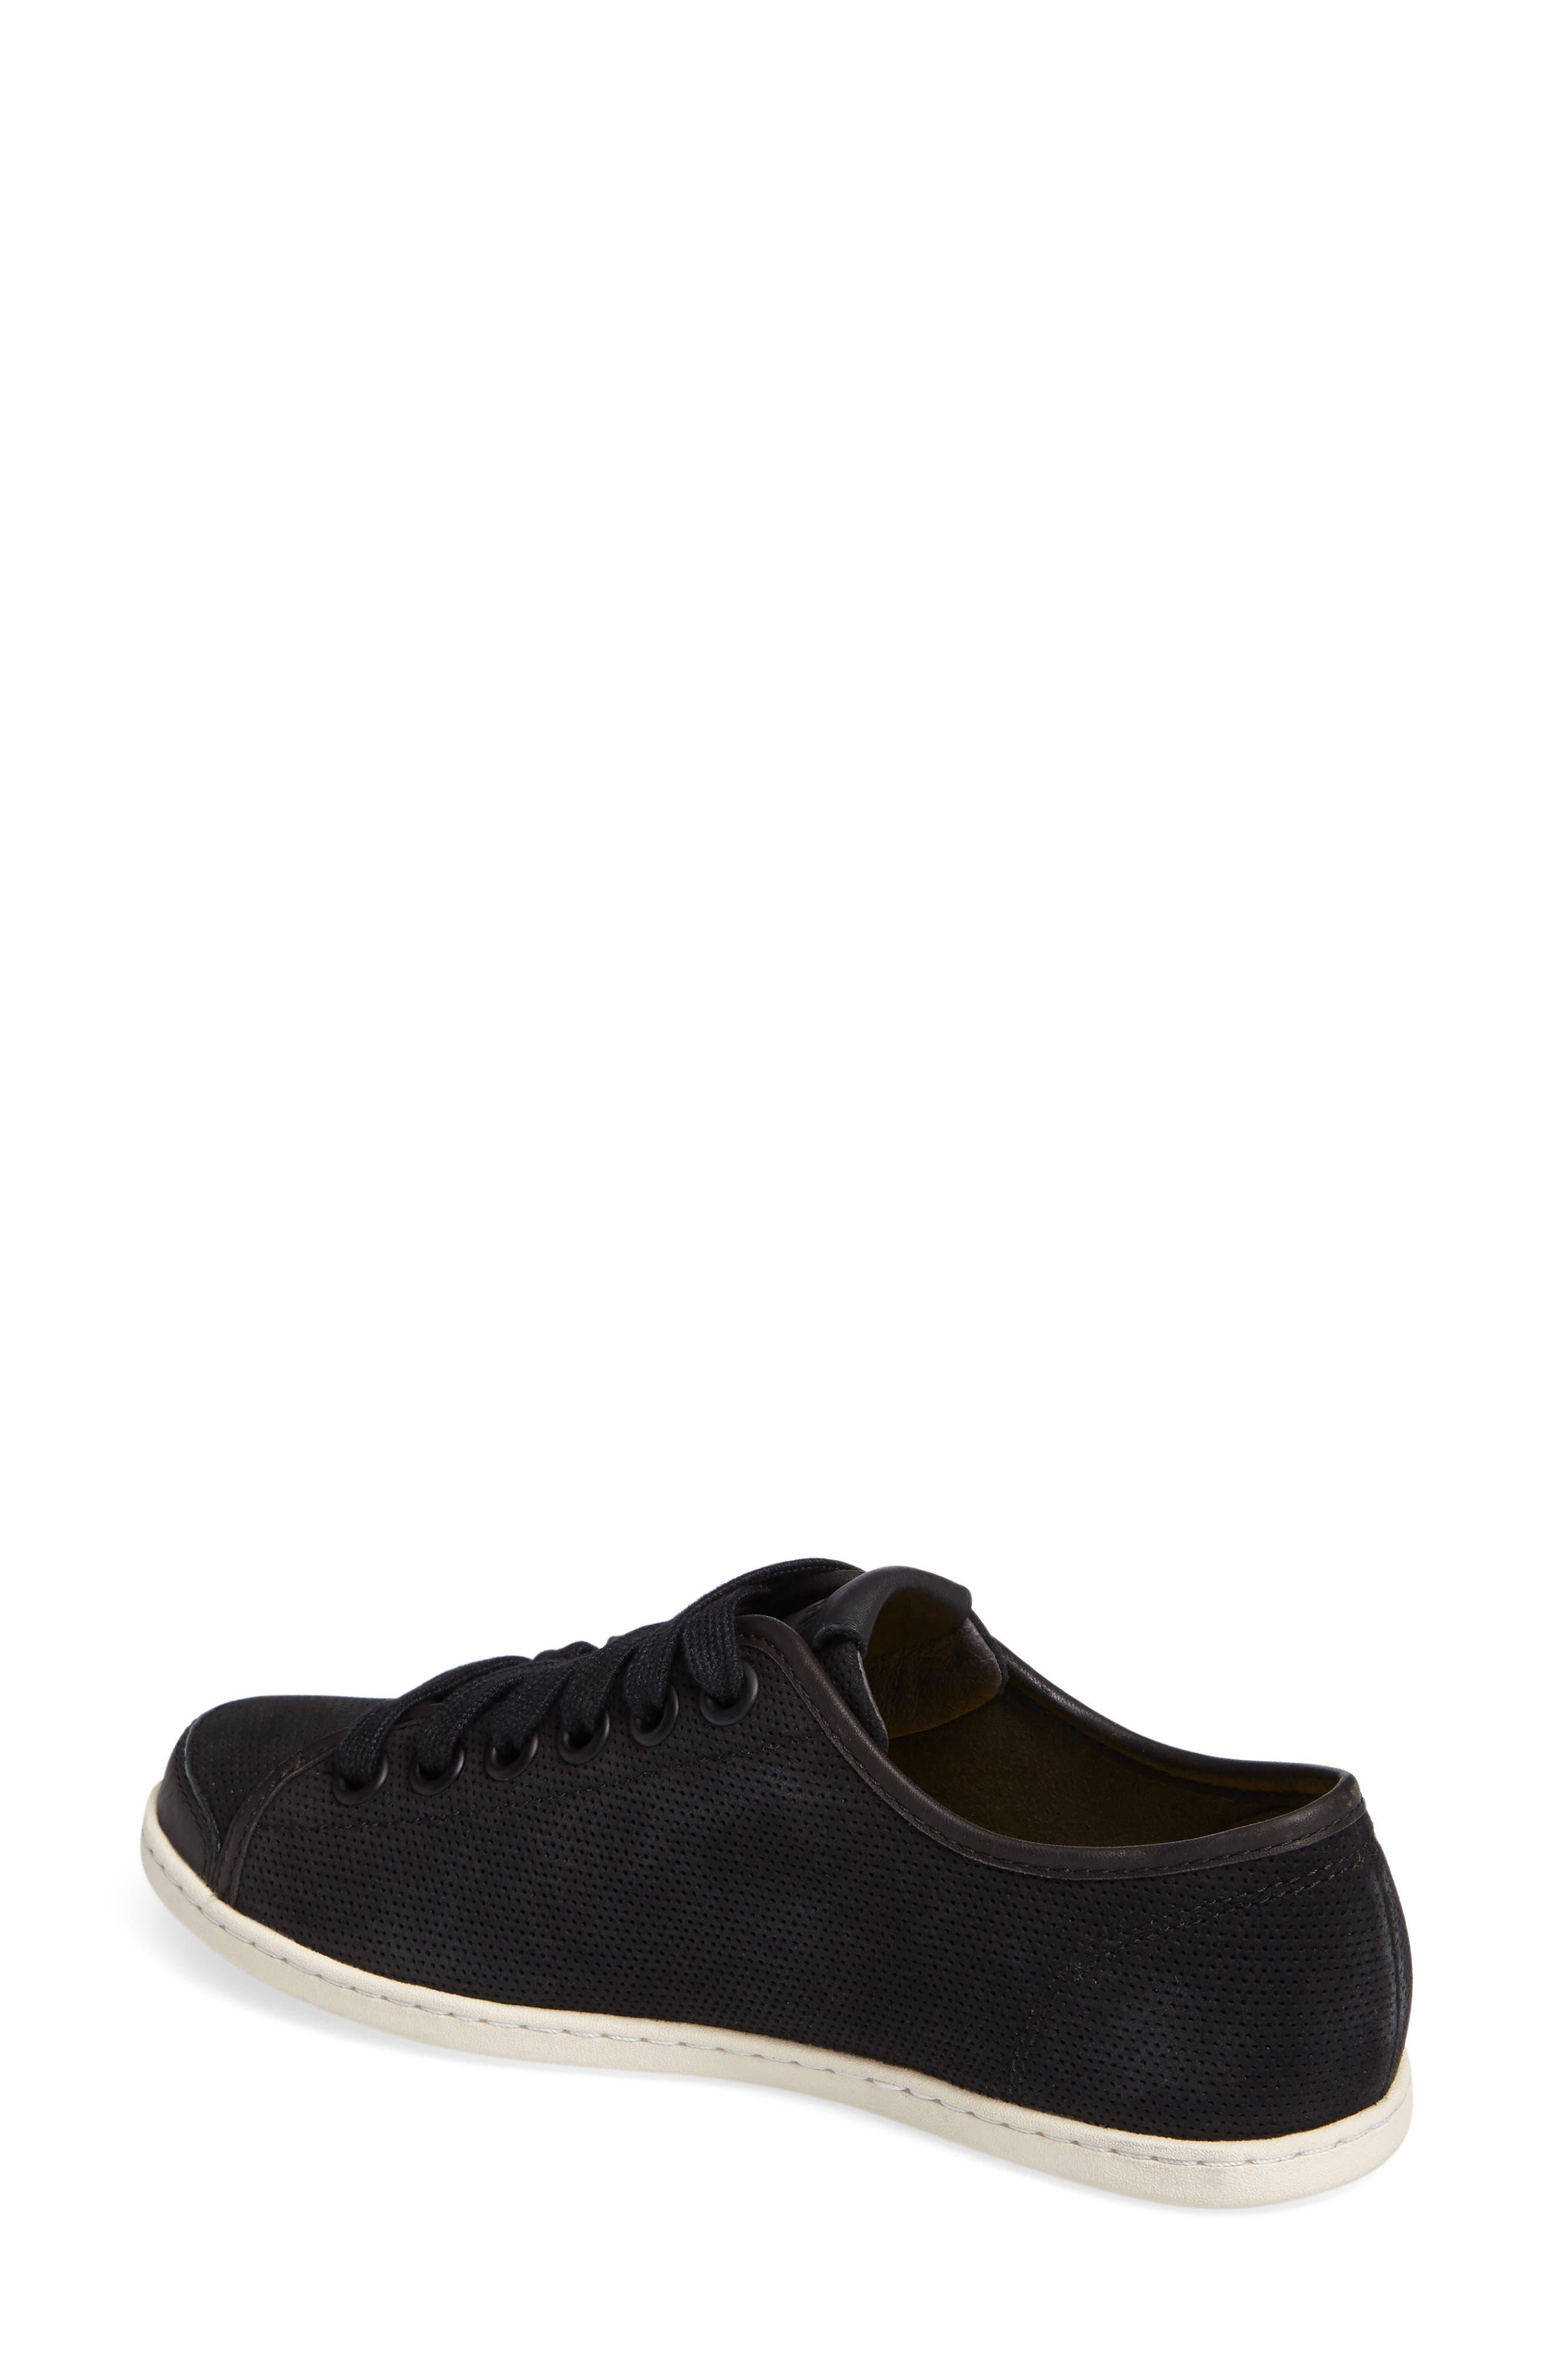 Uno Low Top Sneaker,                             Alternate thumbnail 2, color,                             001